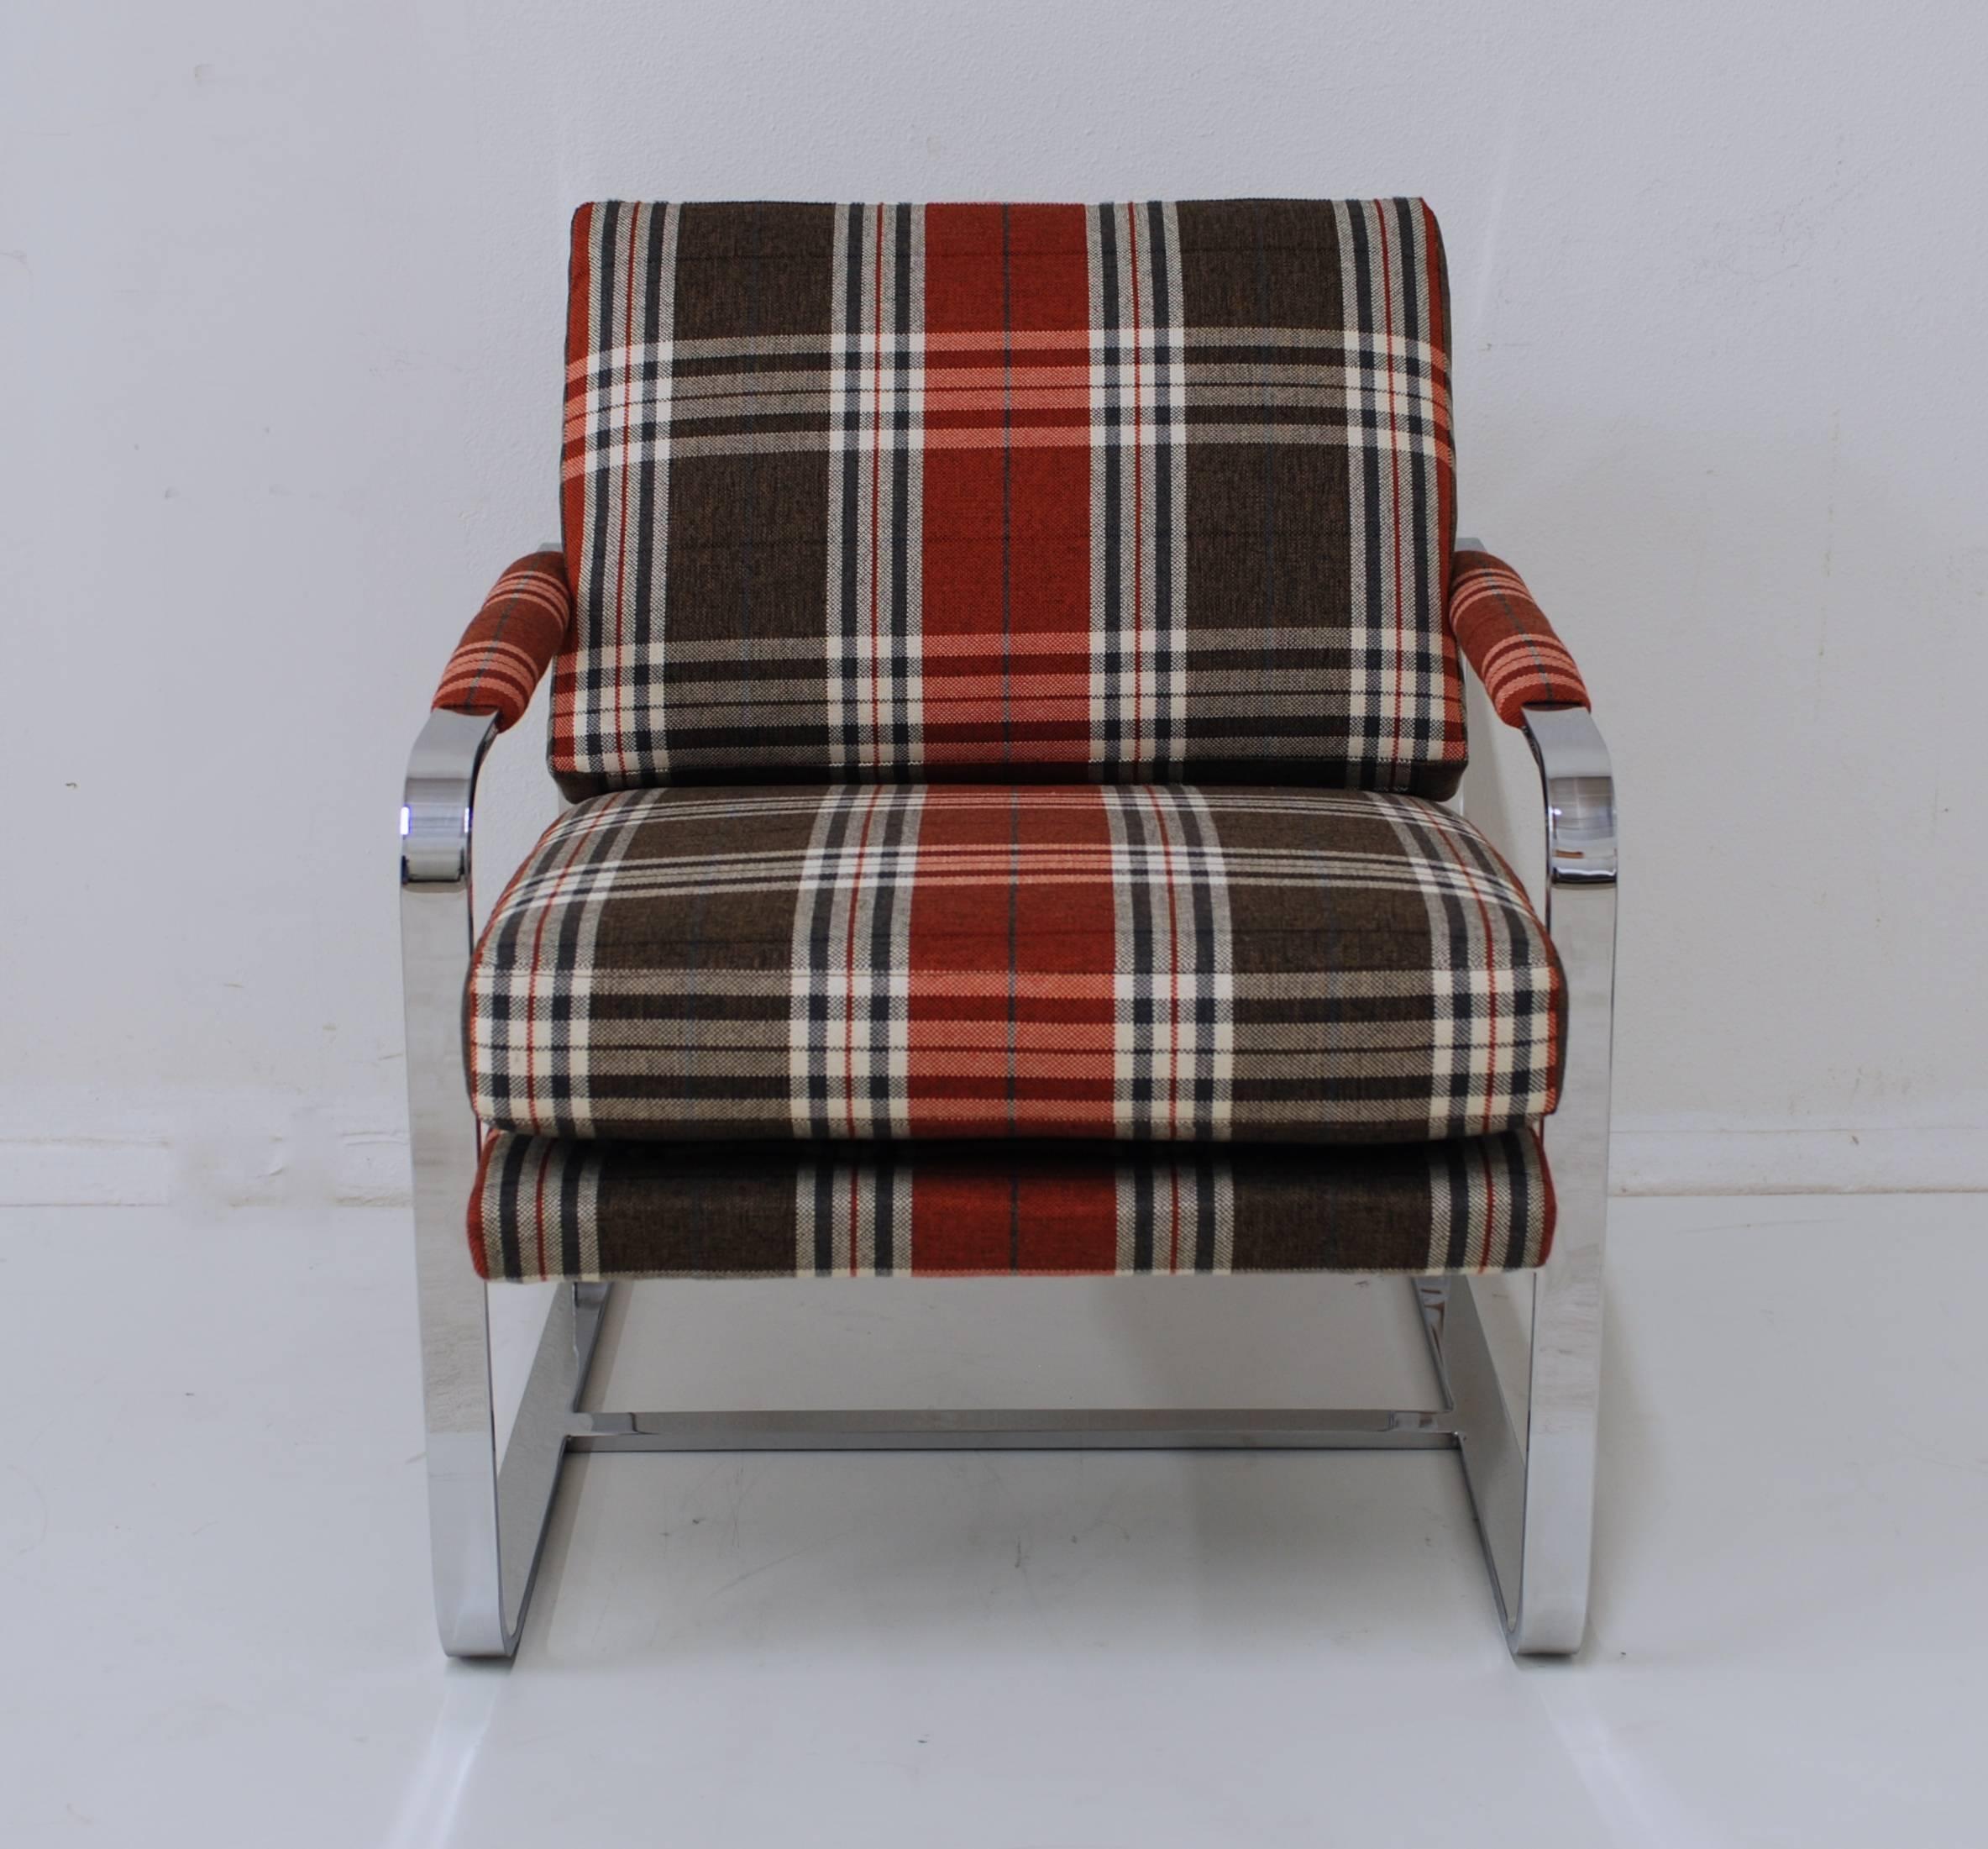 Chrome Milo Baughman Style Lounge Chair With Tartan Fabric For Sale 1